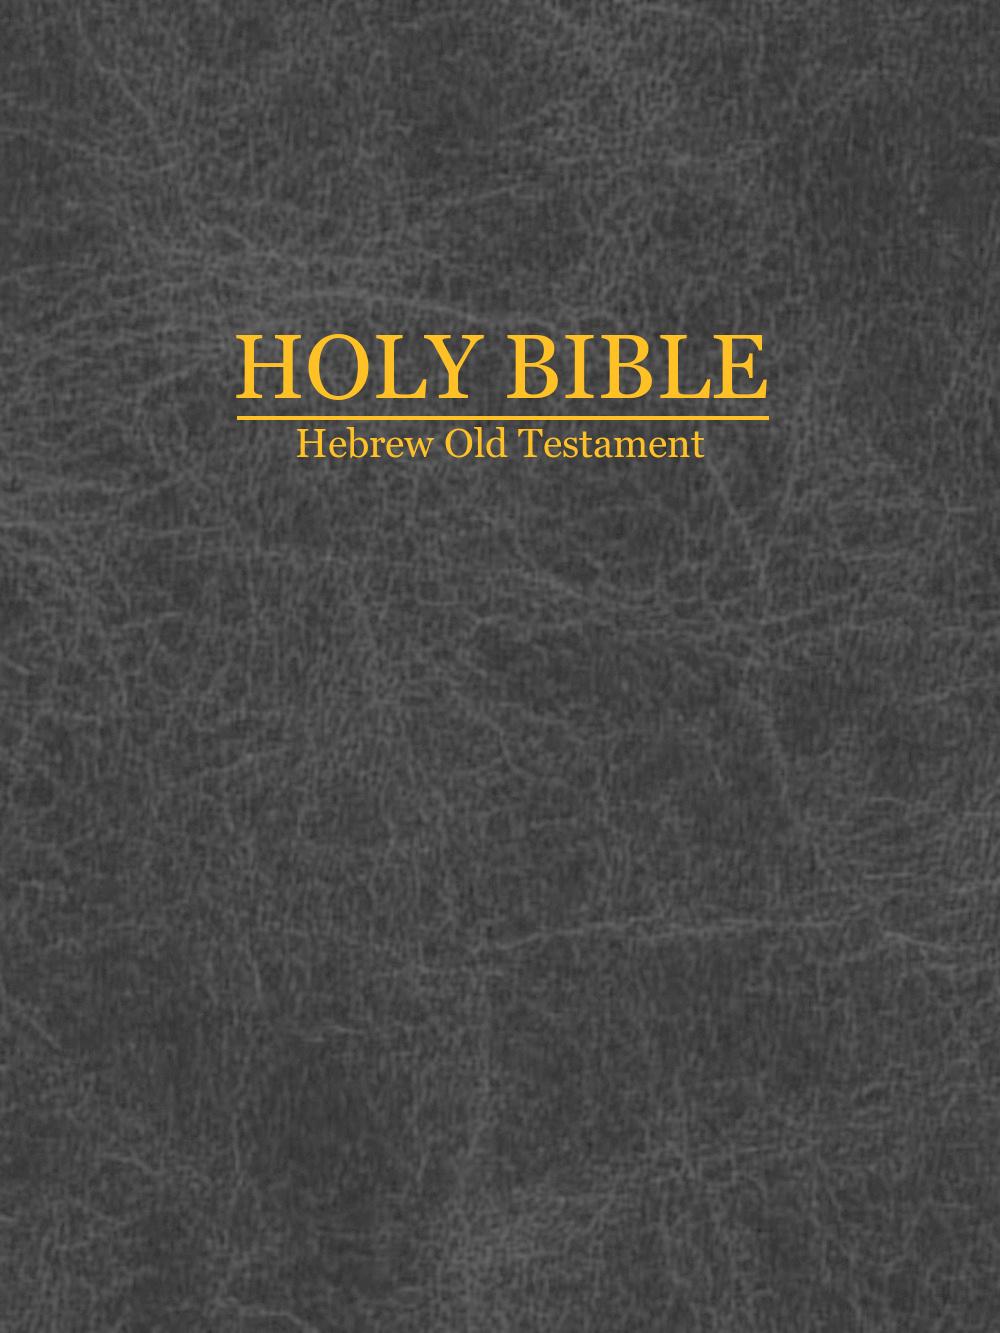 holy bible old testament pdf